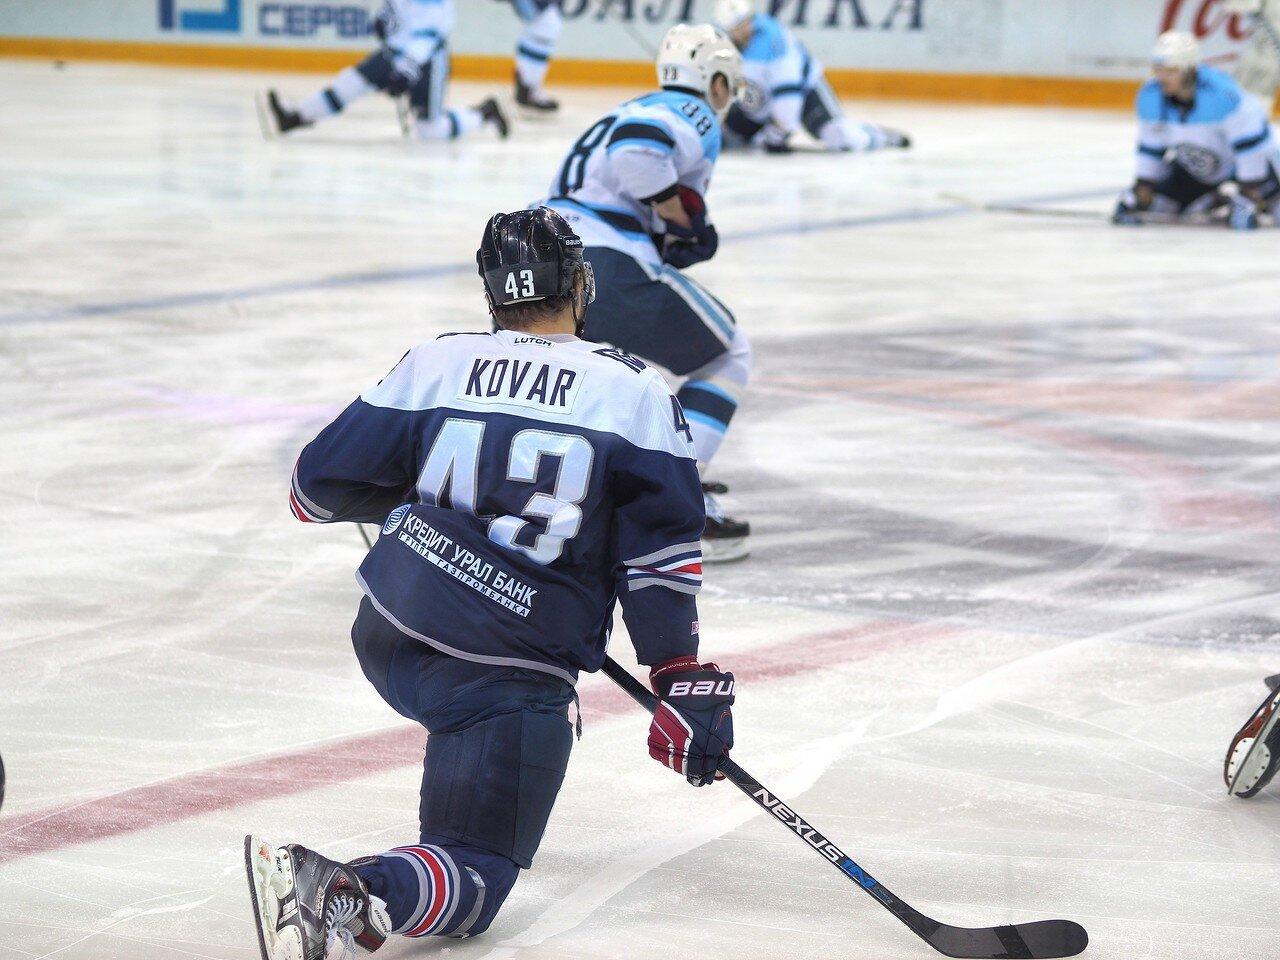 4Плей-офф 2016 Восток 1/2 Металлург - Сибирь 10.03.2016